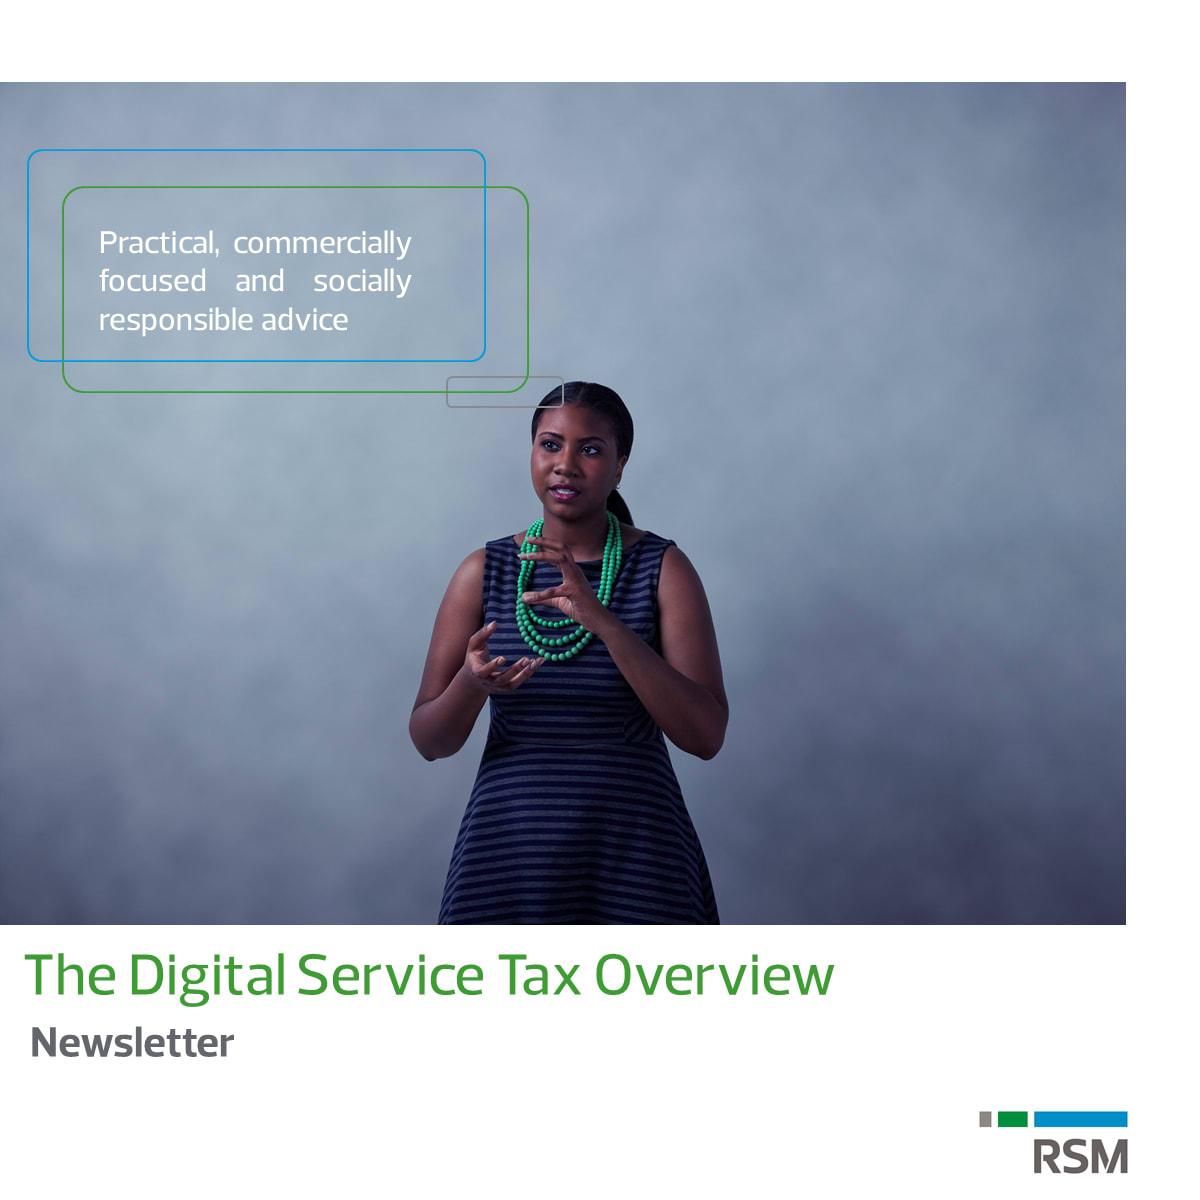 public://media/digital_service_tax_newsletter.png